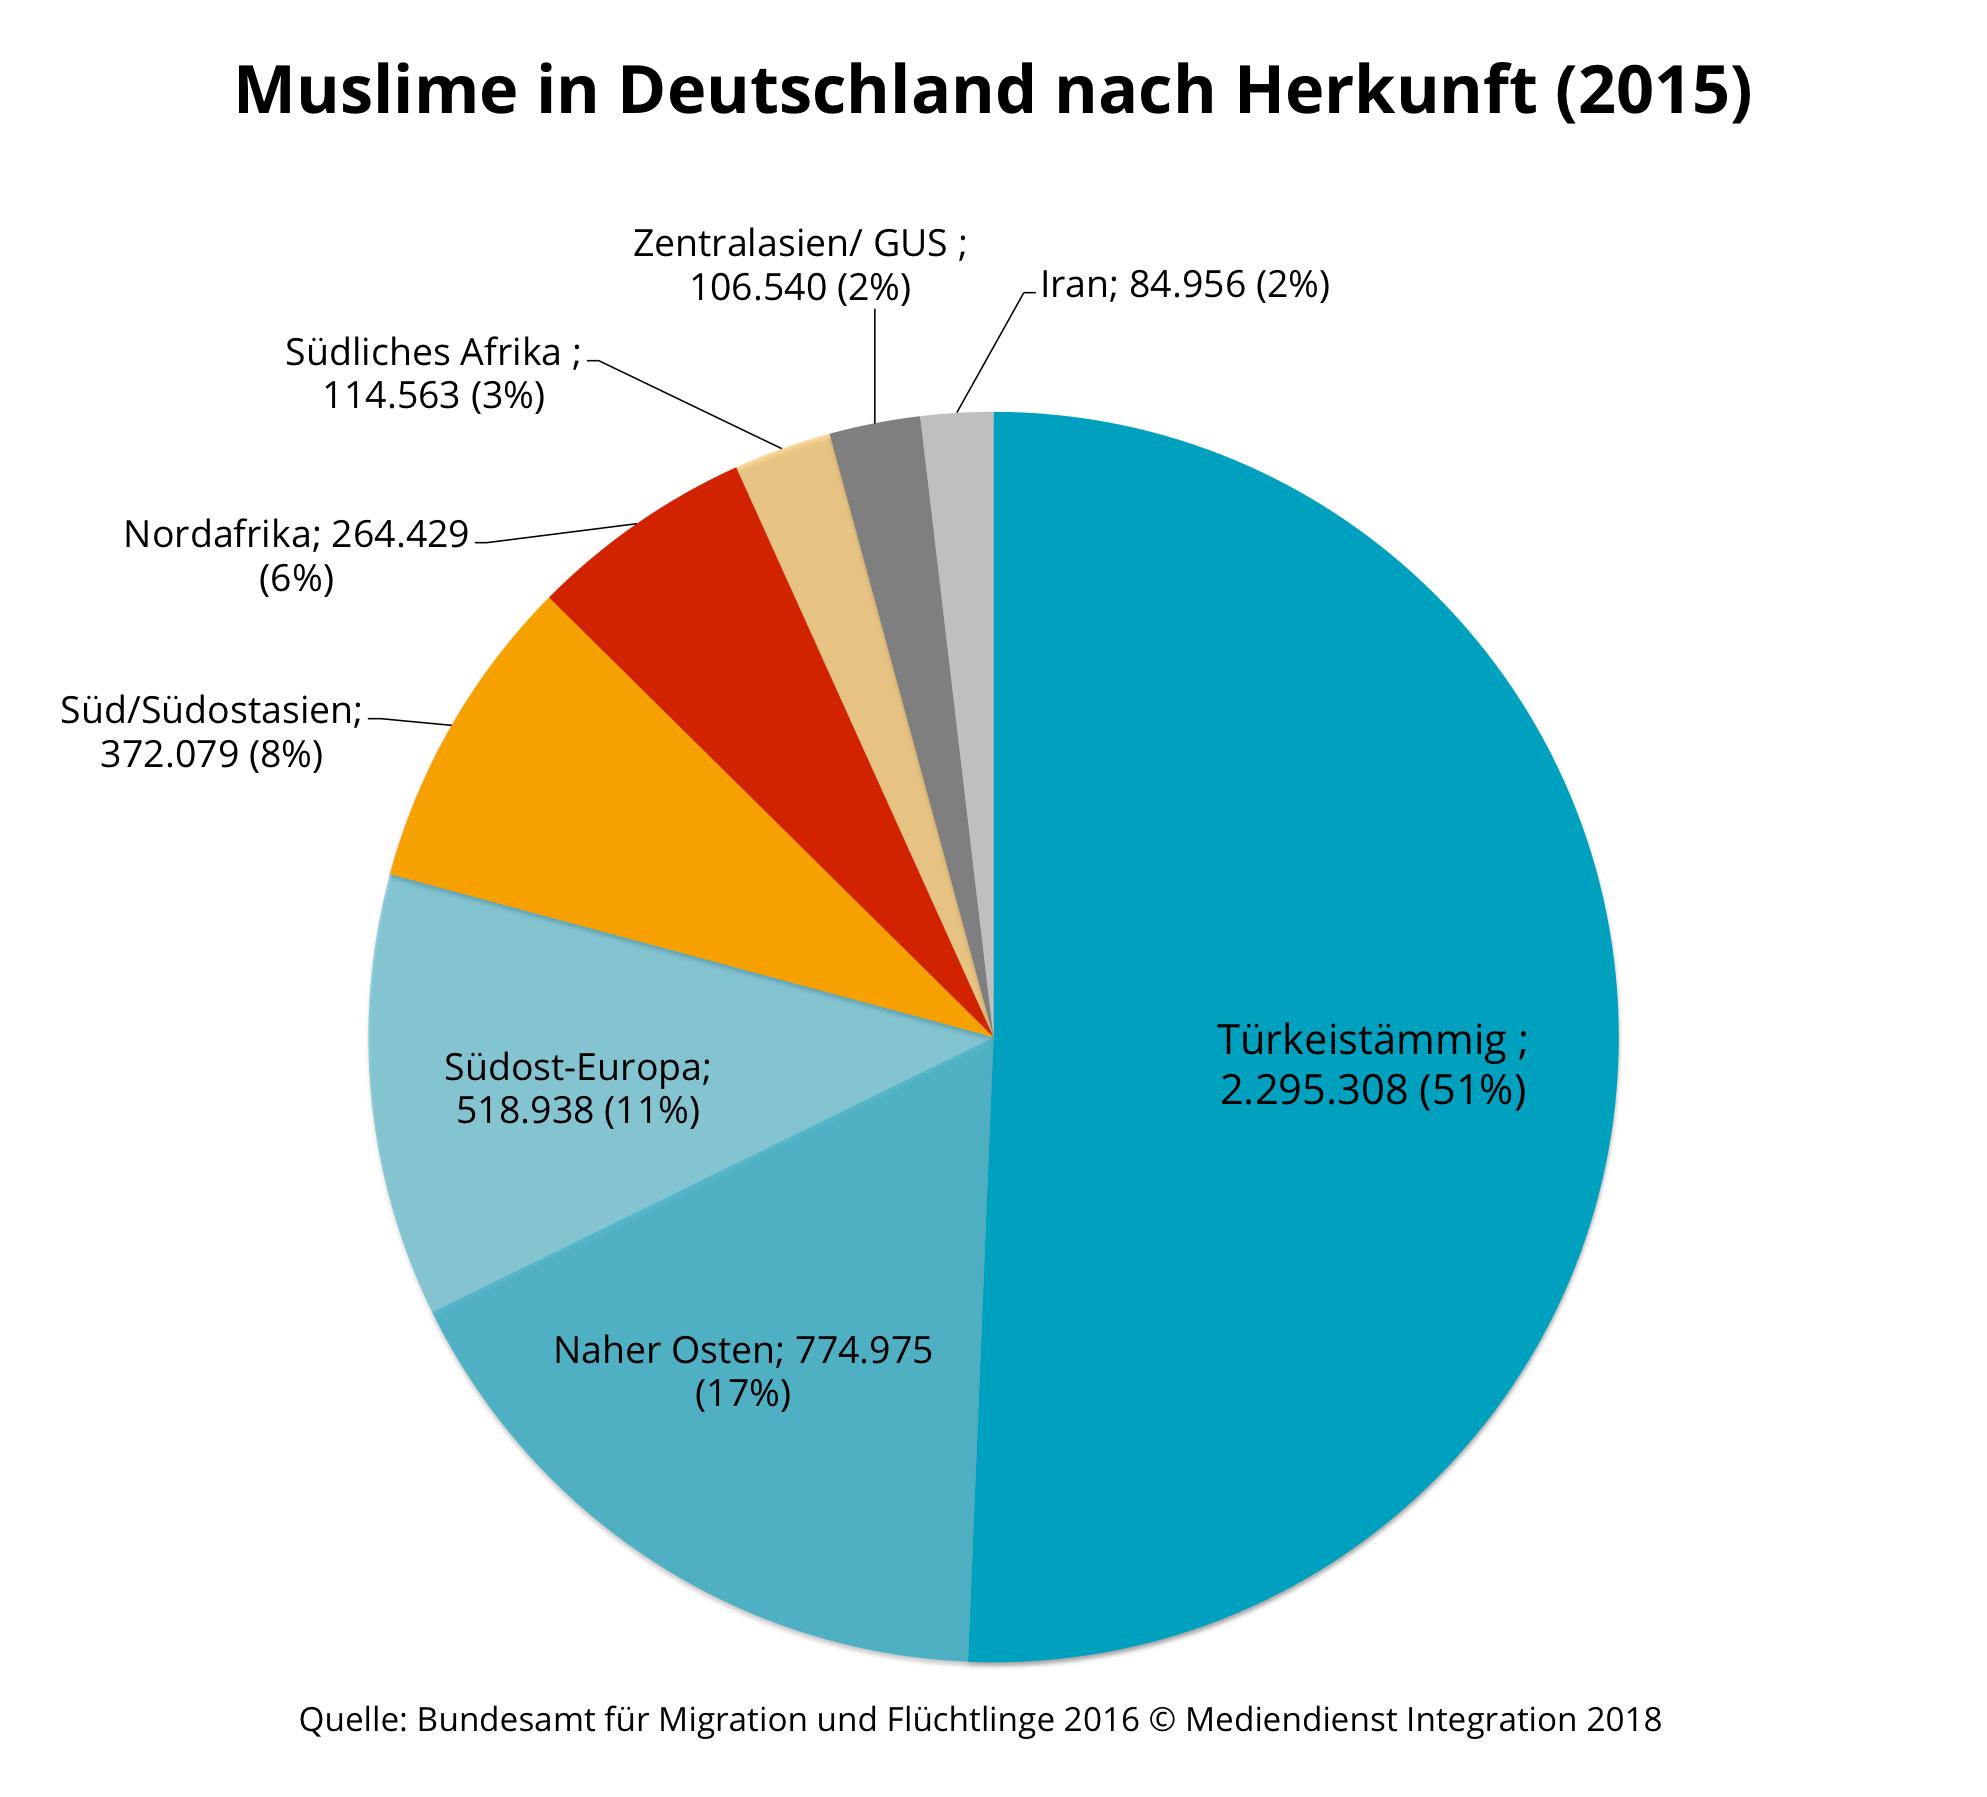 Wie Viele Muslime Gibt Es